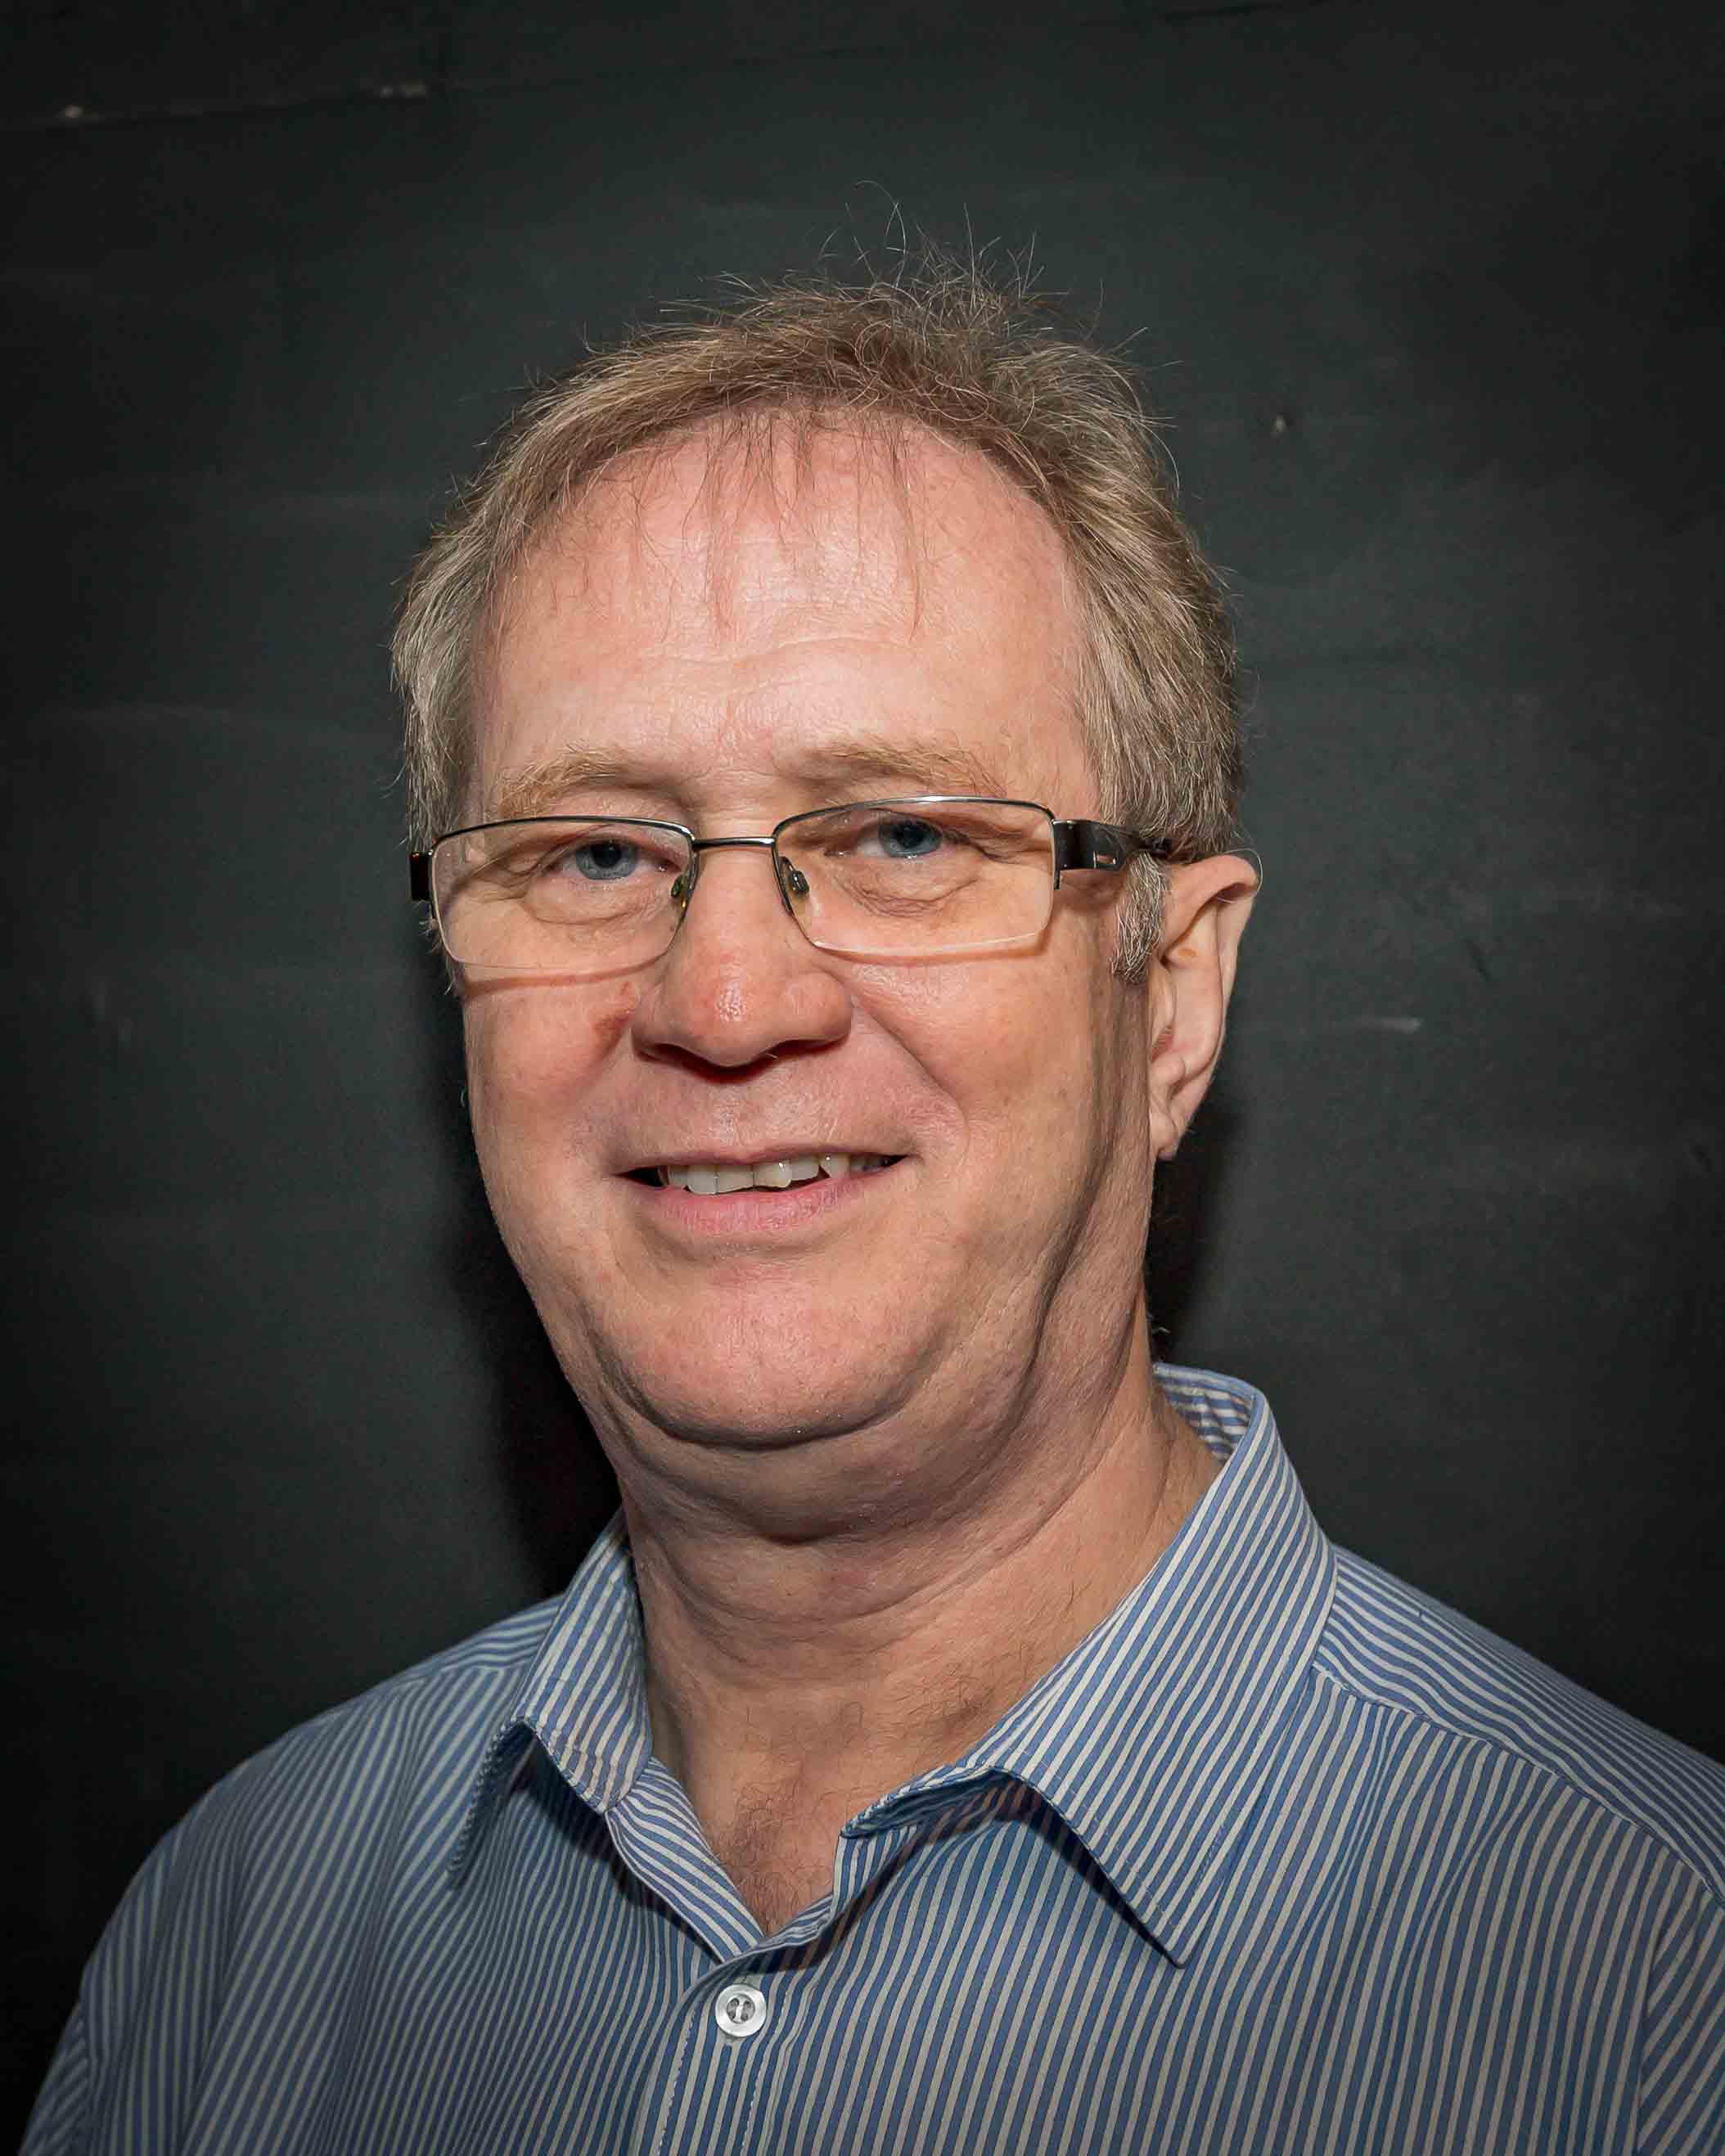 Melvin Bradley, Director, Workplace mental Health Limited.